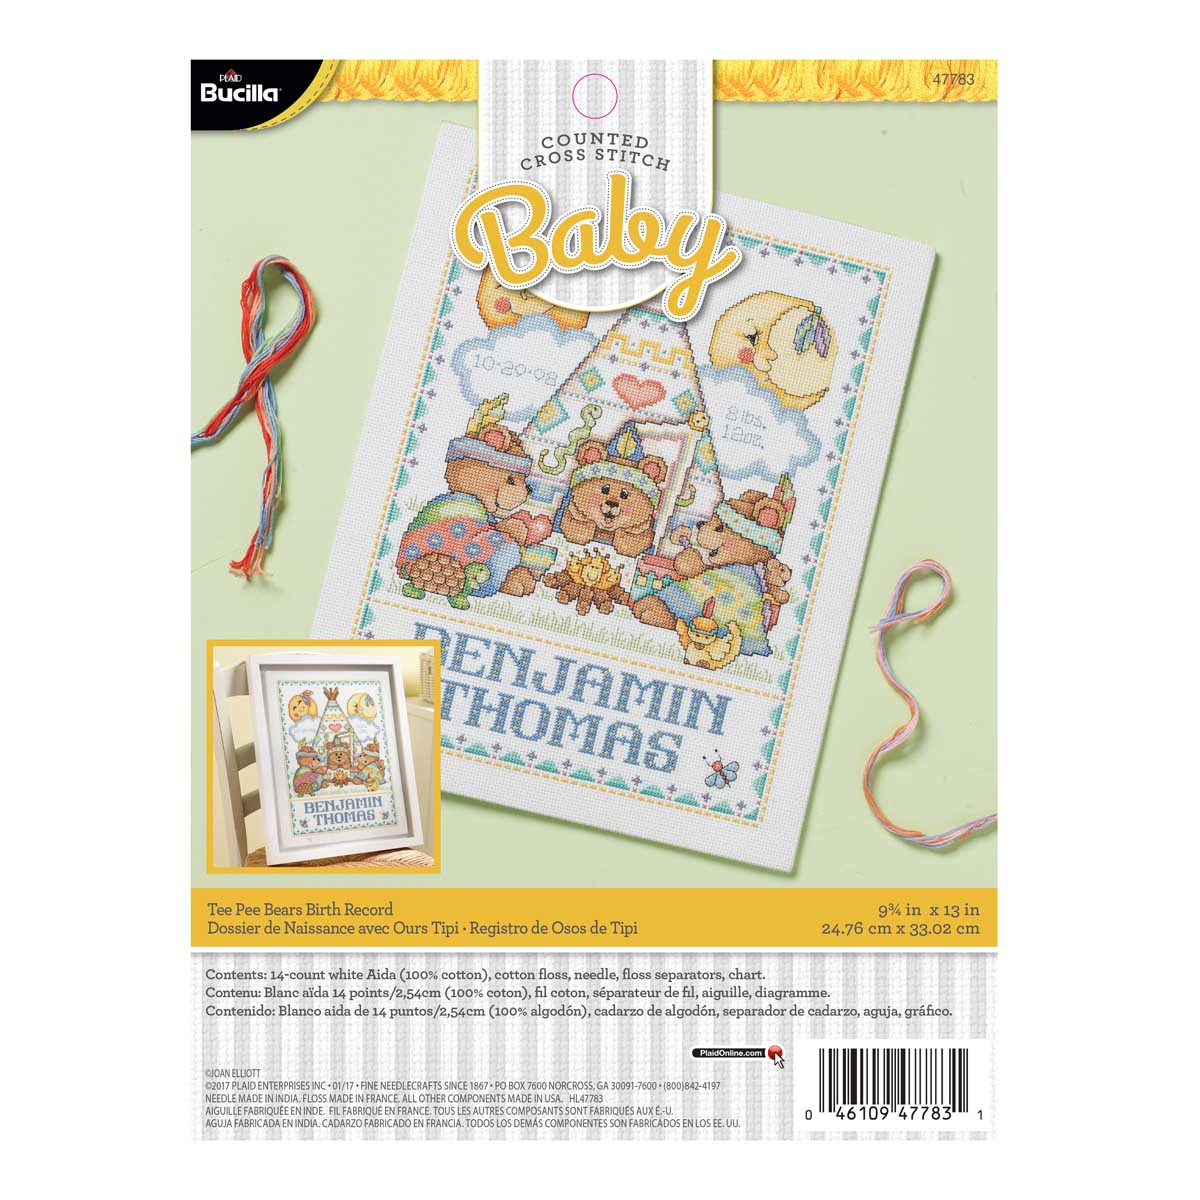 Bucilla ® Baby - Counted Cross Stitch - Crib Ensembles - Tee Pee Bears - Birth Record Kit - 47783